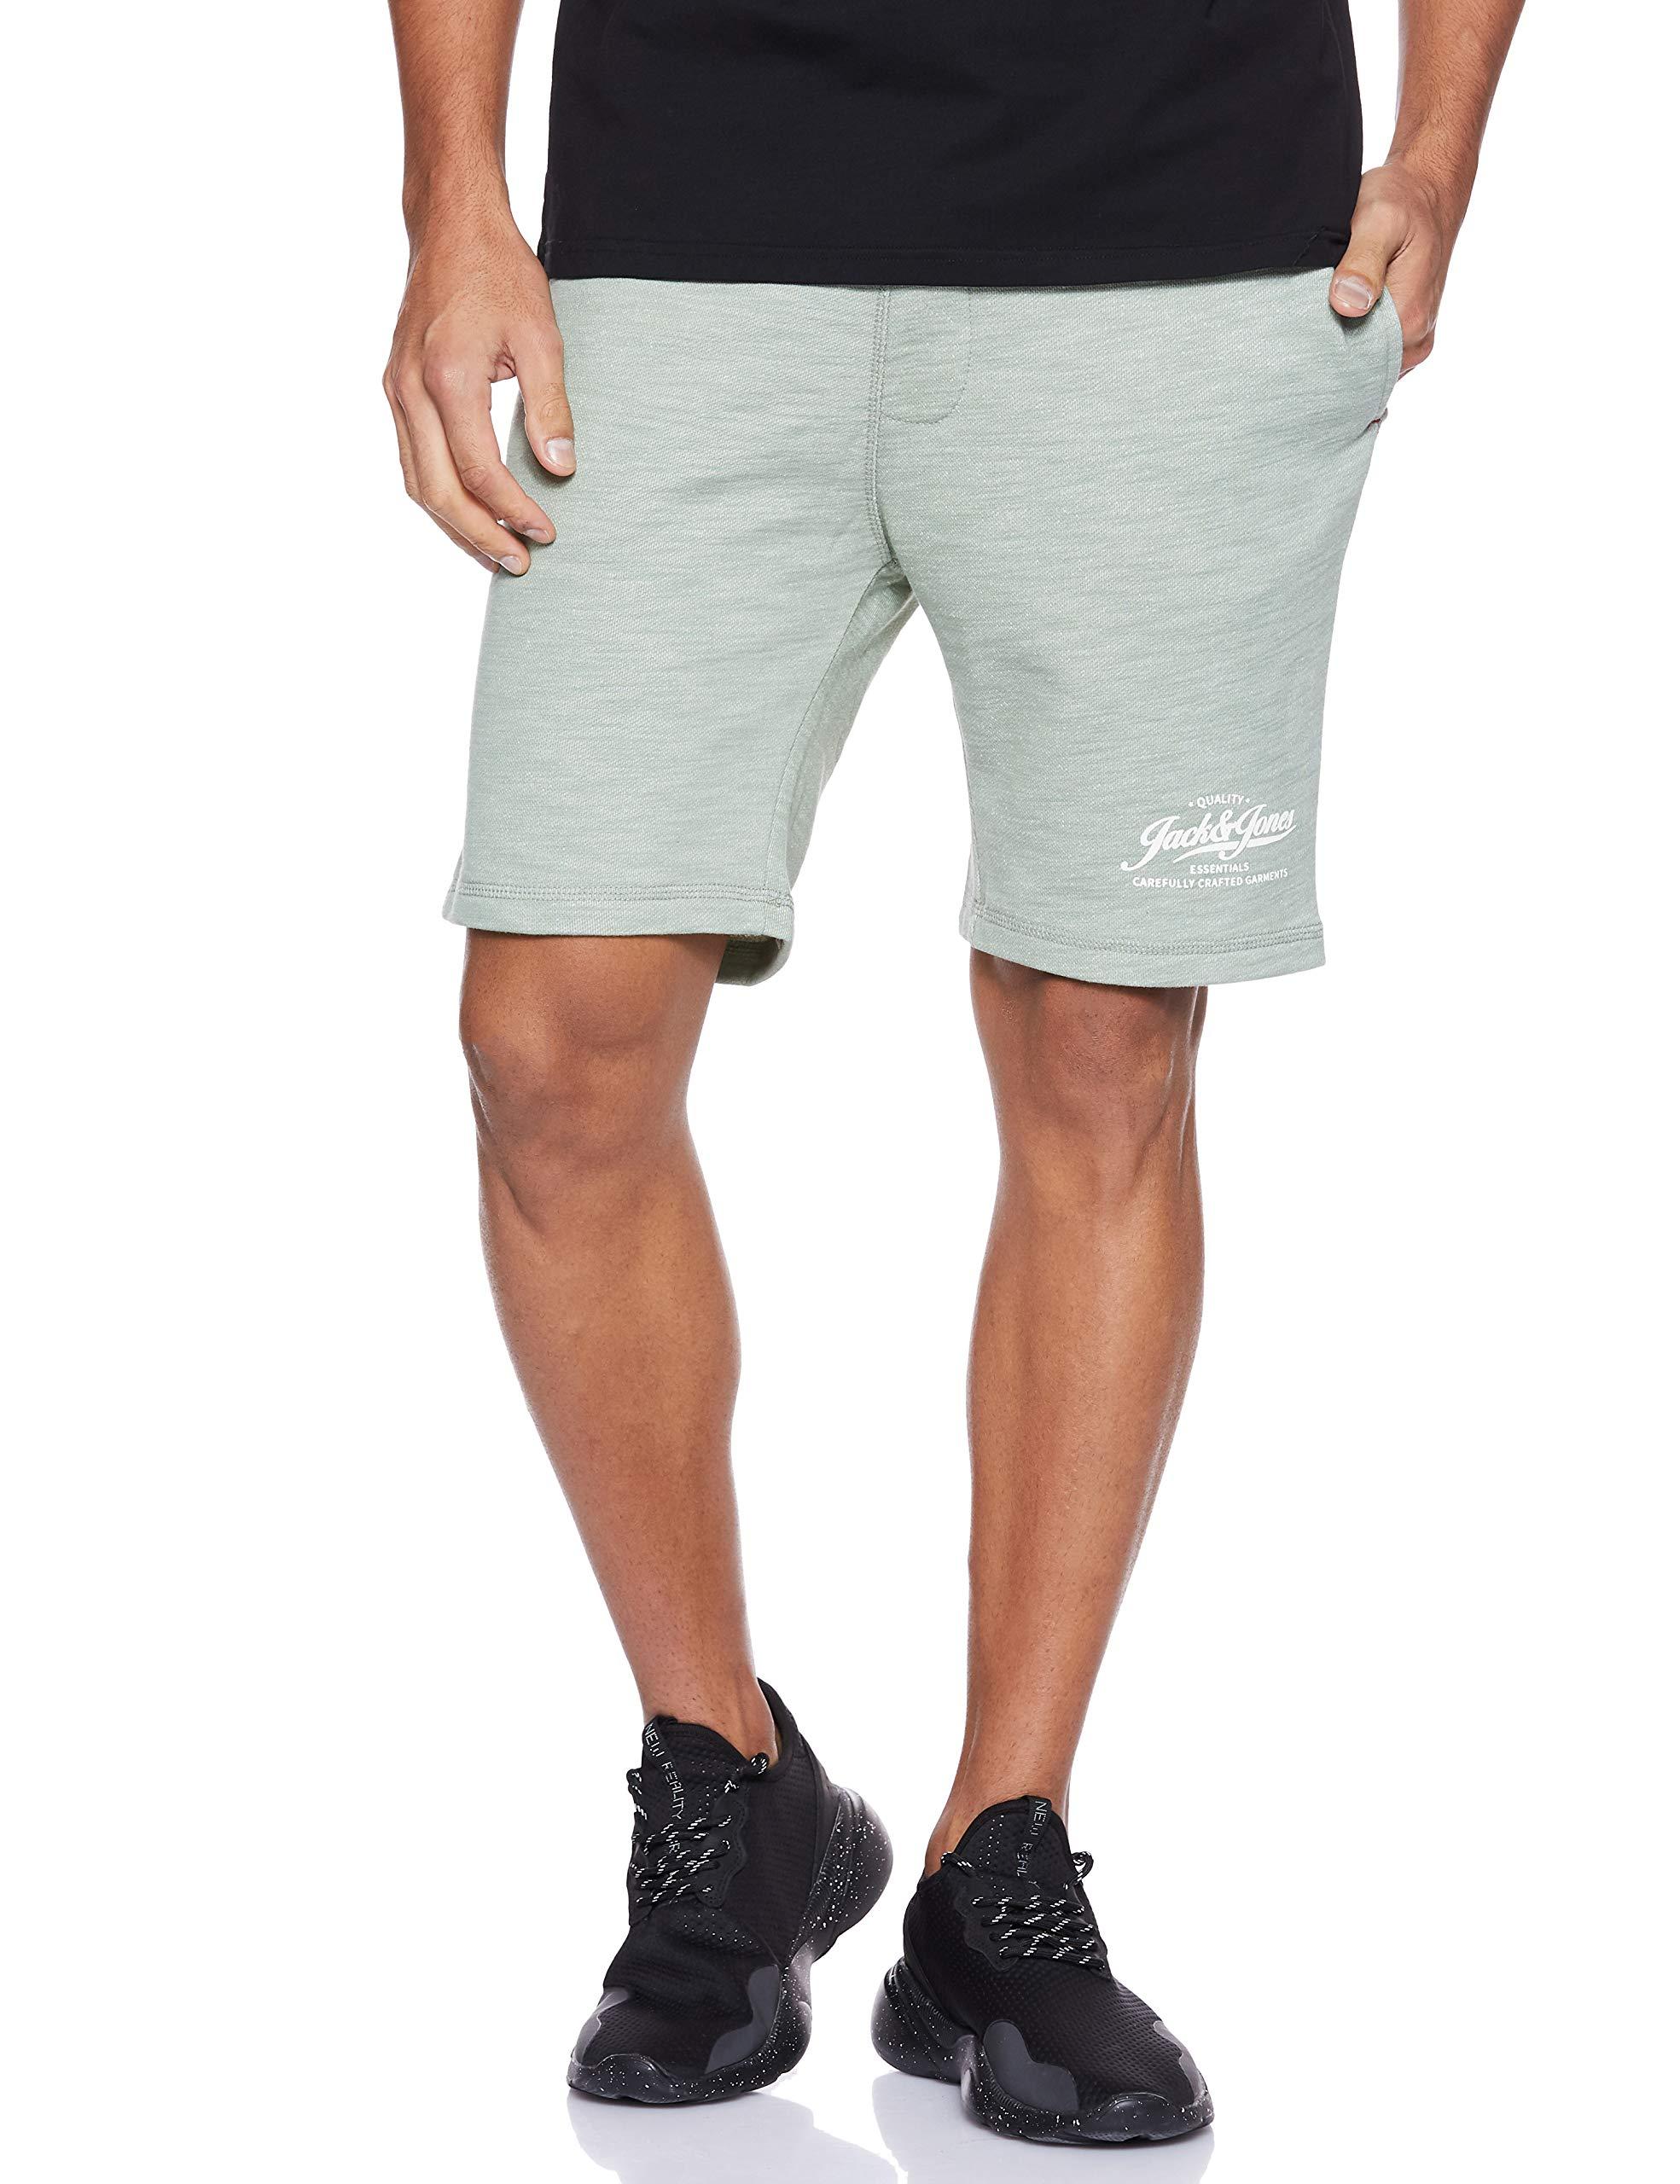 Jack and Jones Mens Sweat Shorts